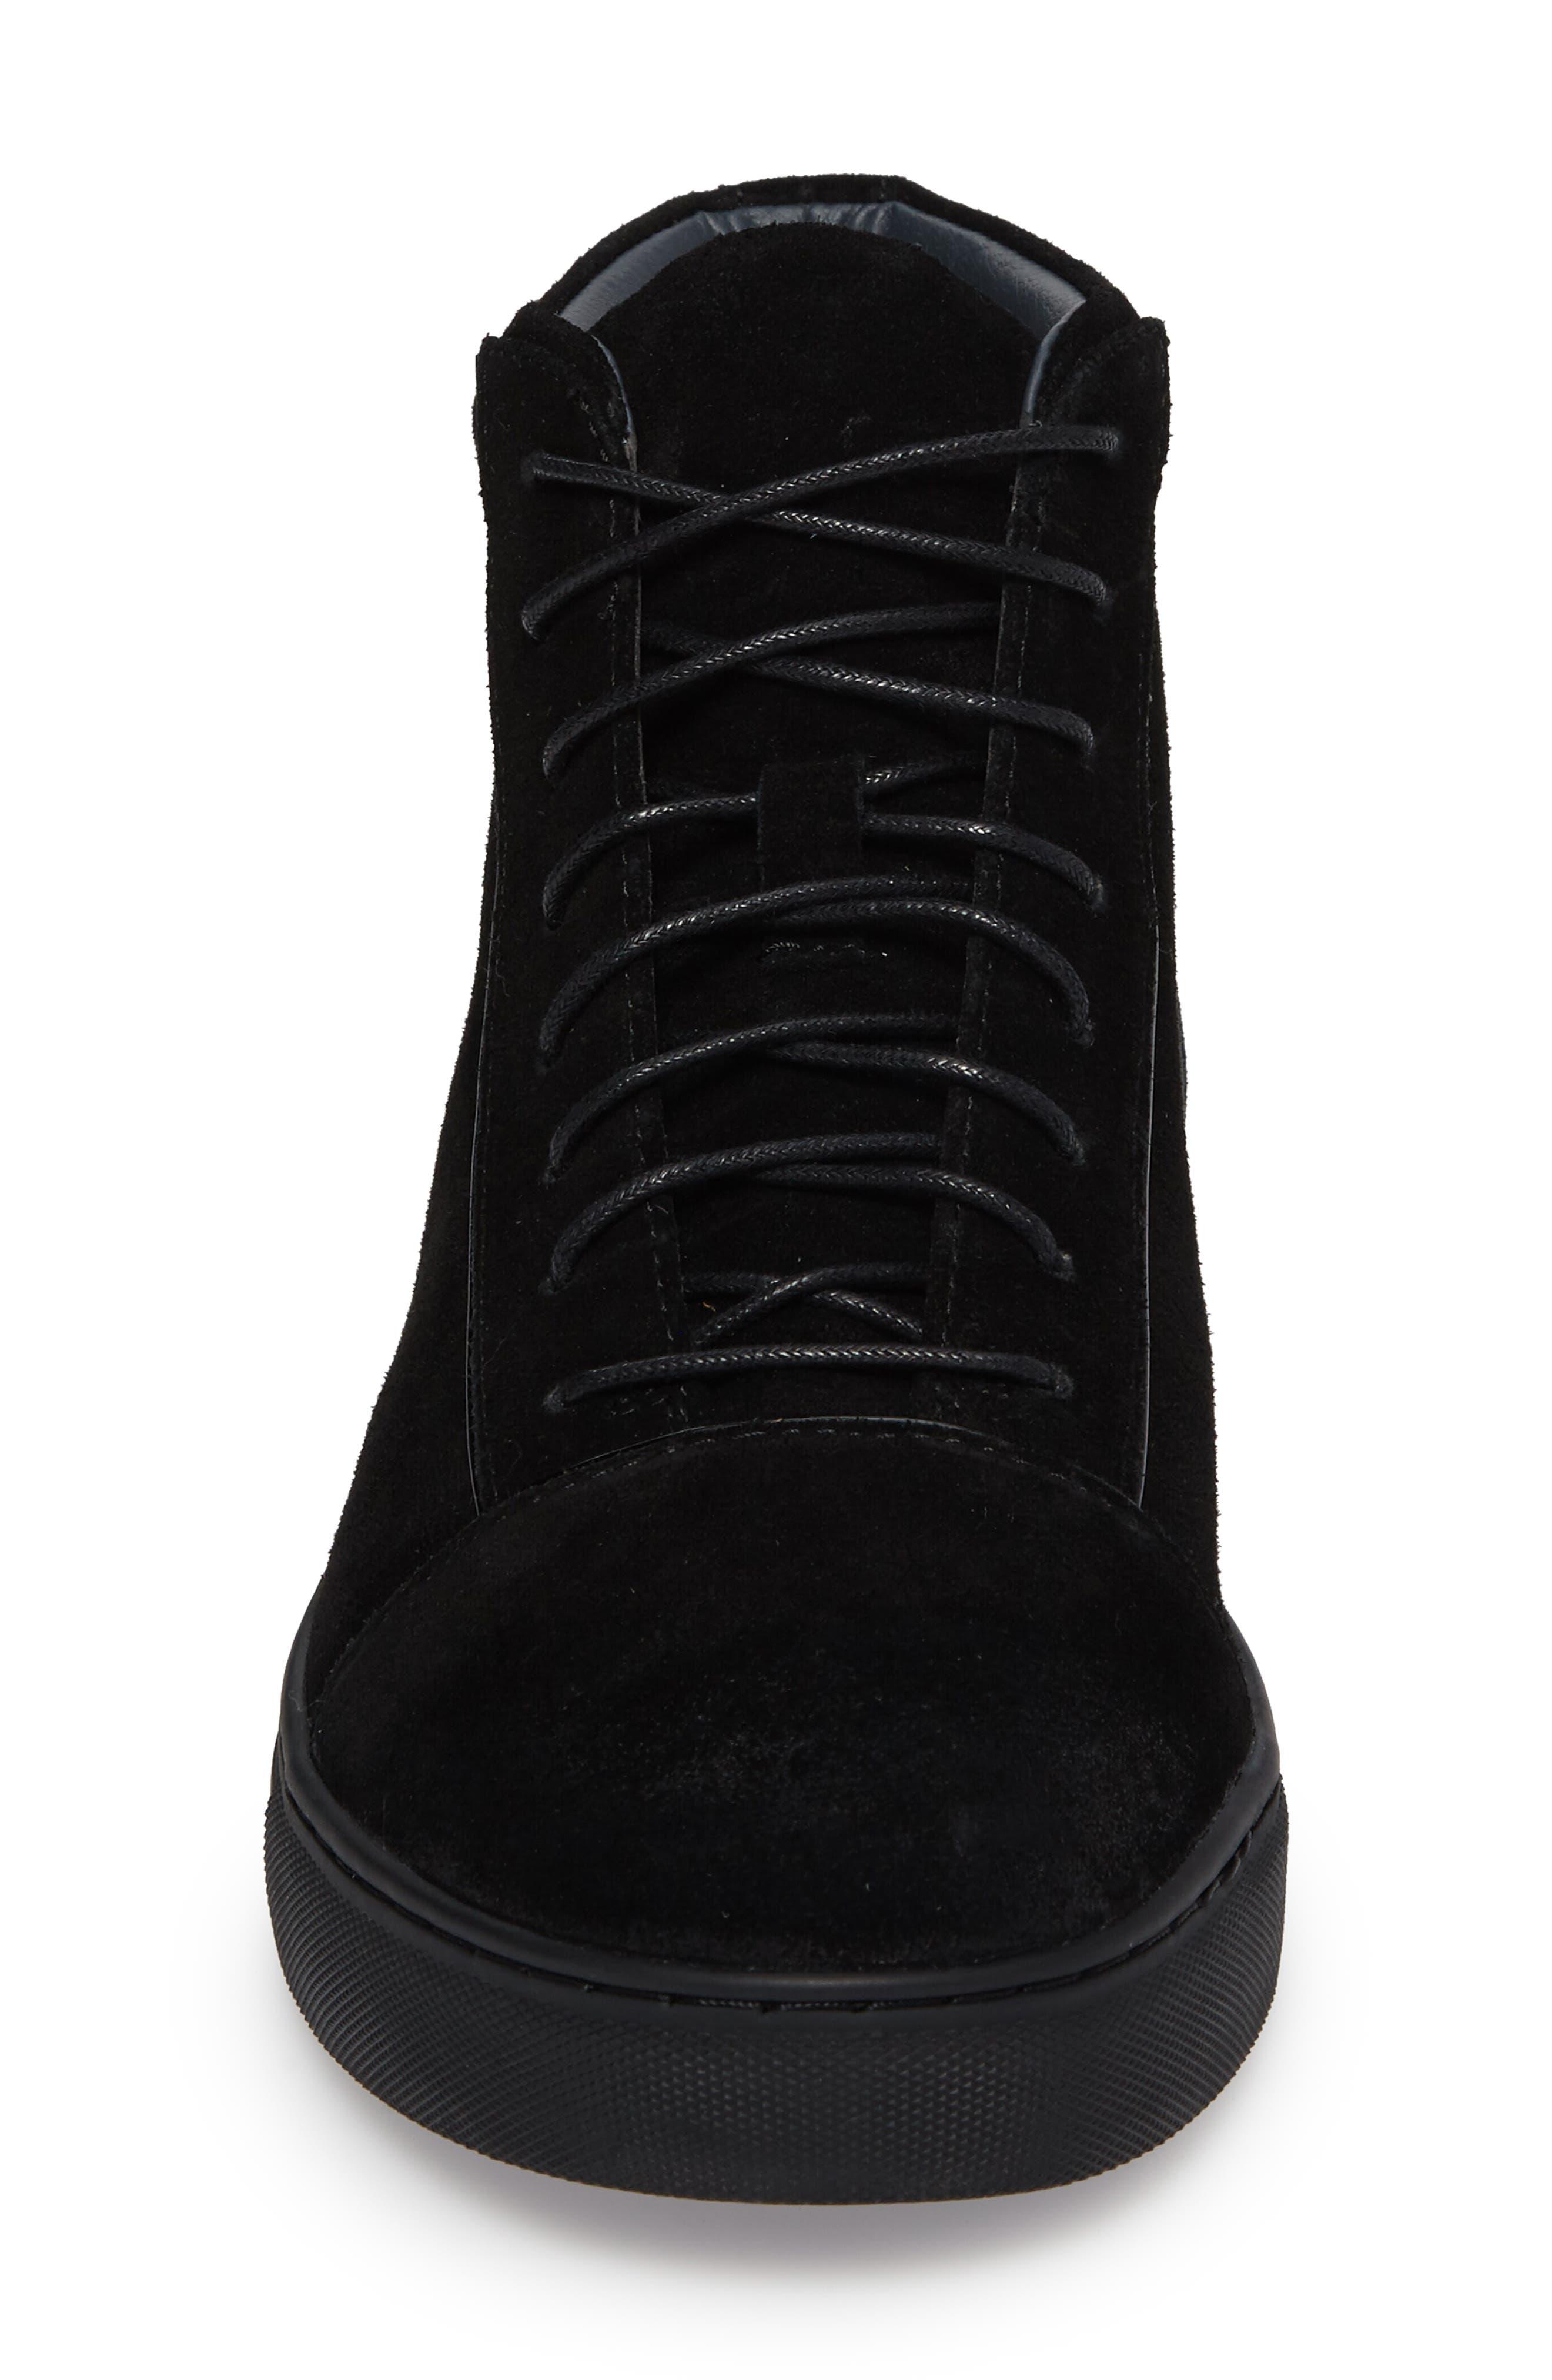 Grundy Sneaker,                             Alternate thumbnail 4, color,                             Black Suede